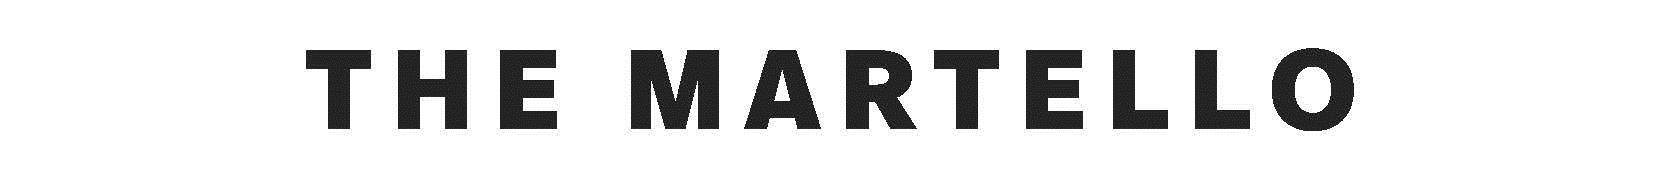 The Martello Logo